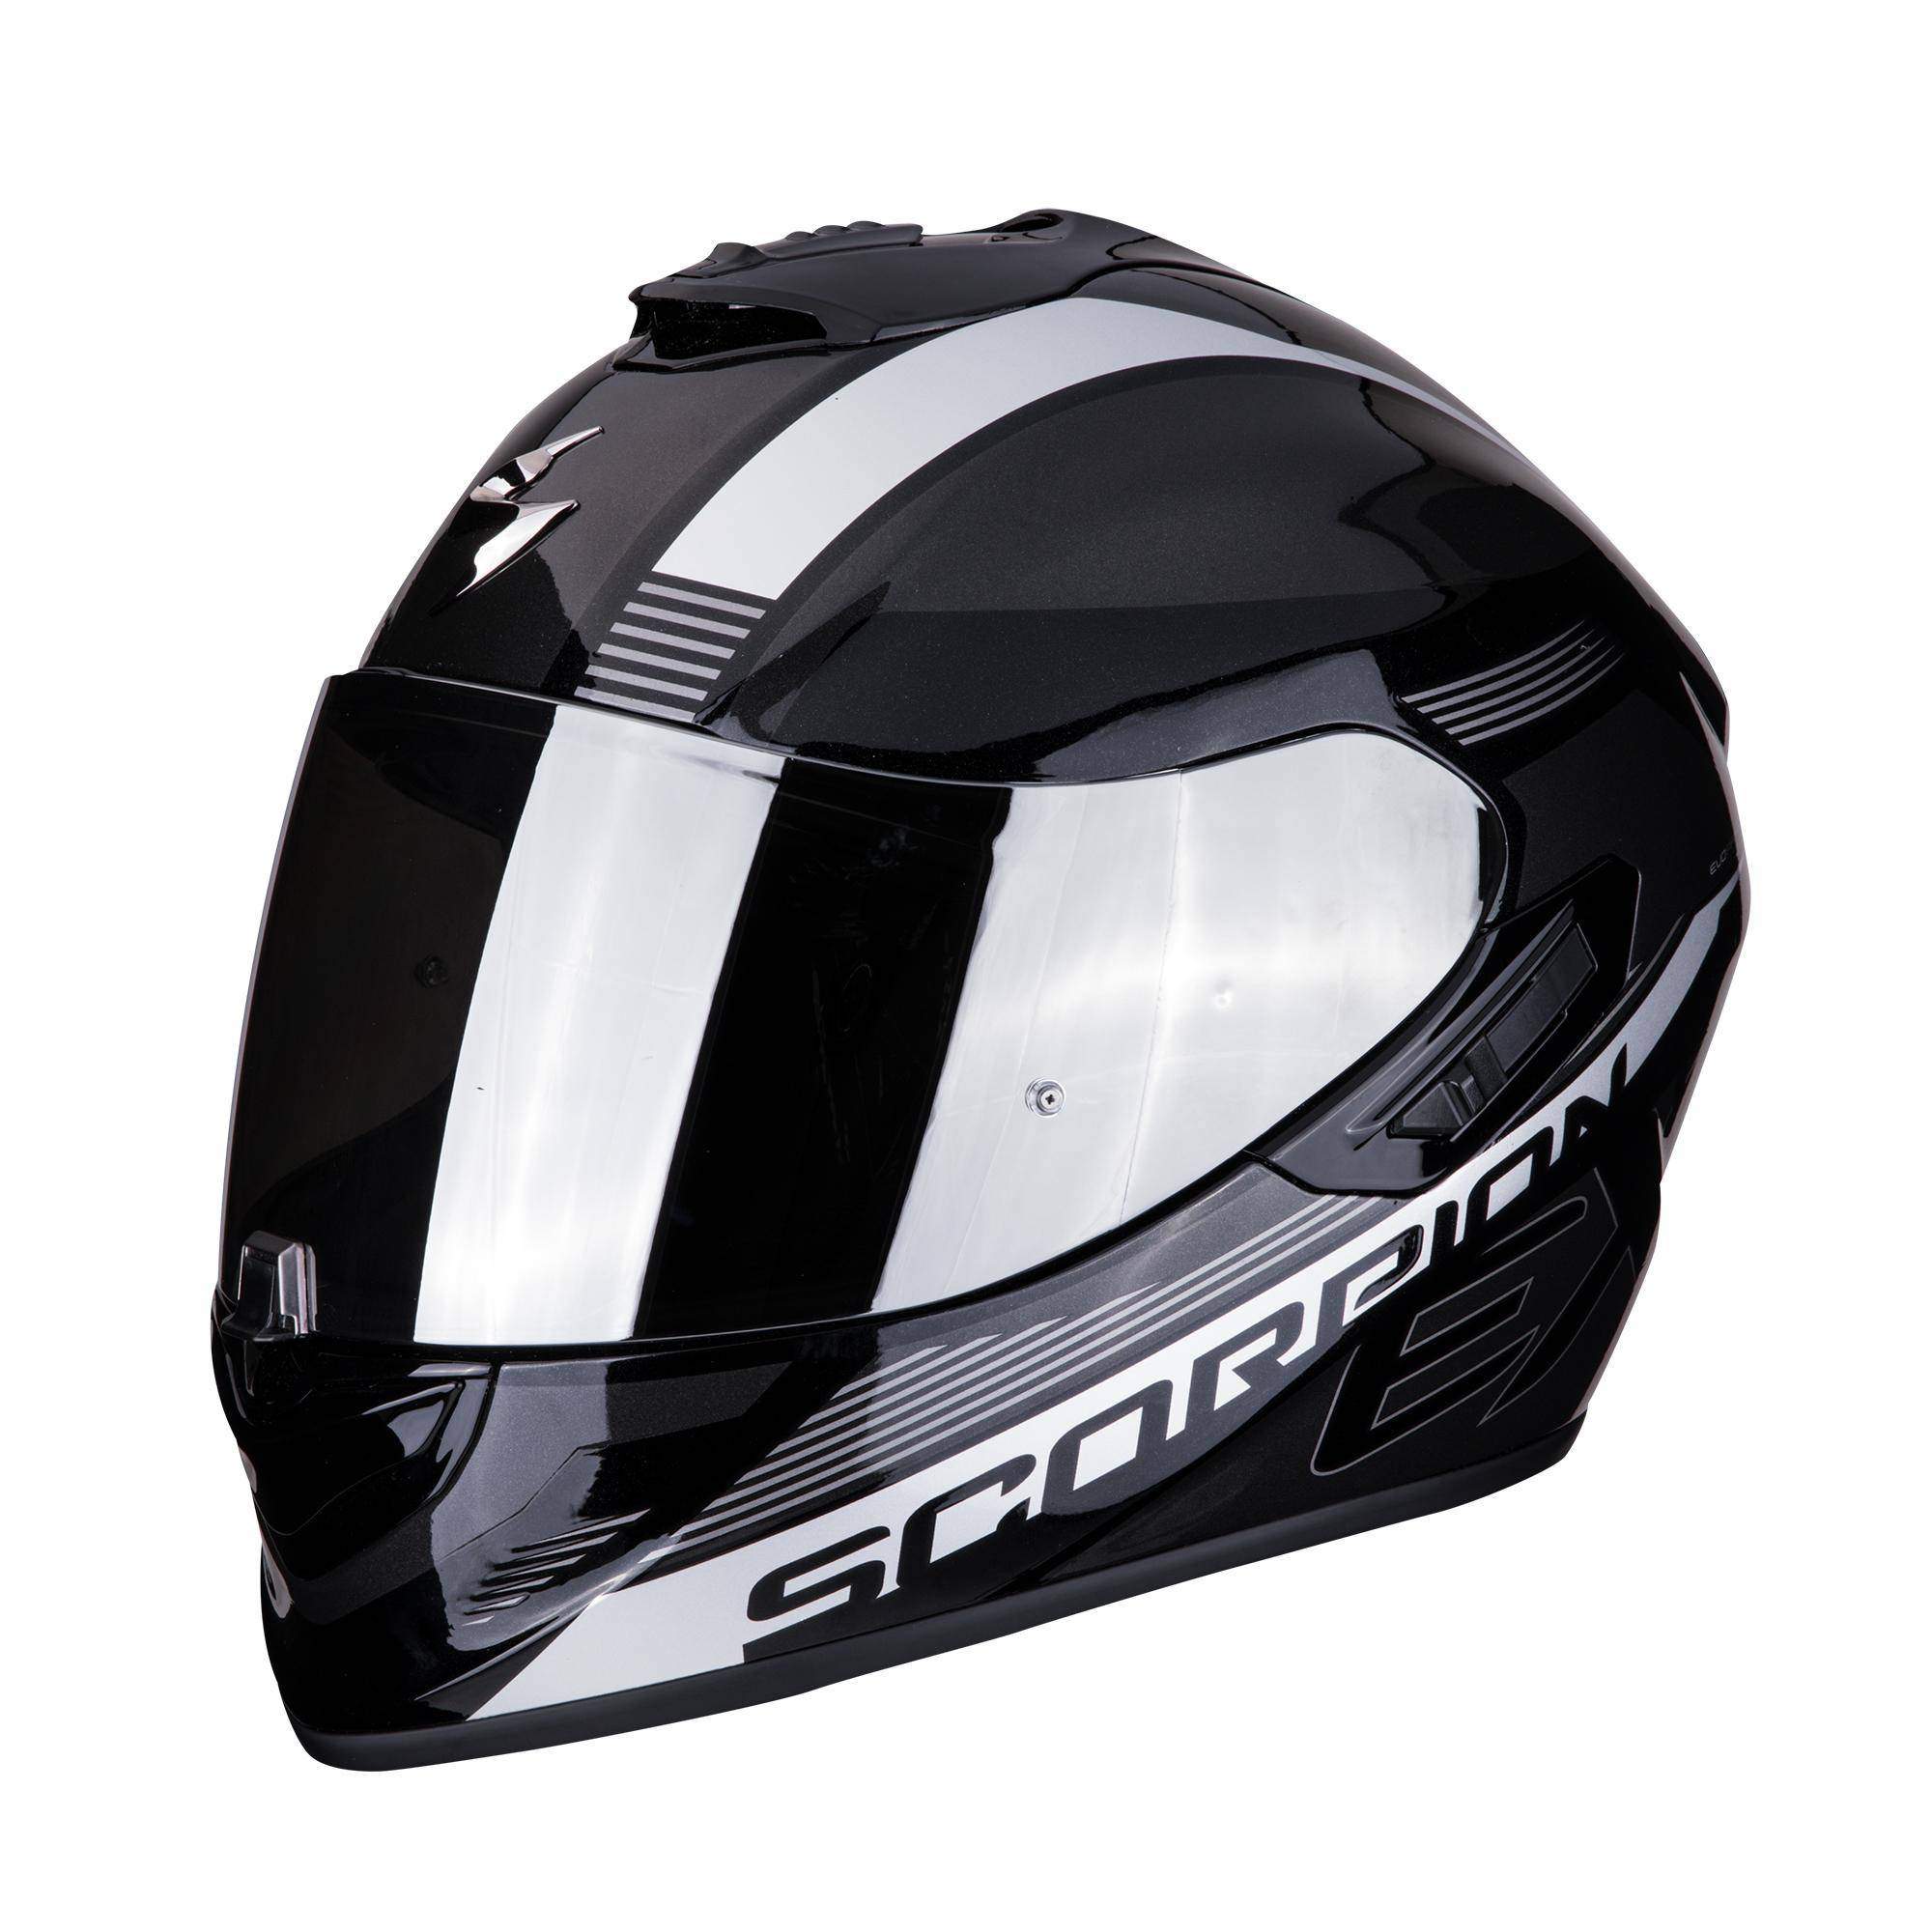 scorpion casco moto integrale  exo-1400 air free metal black silver